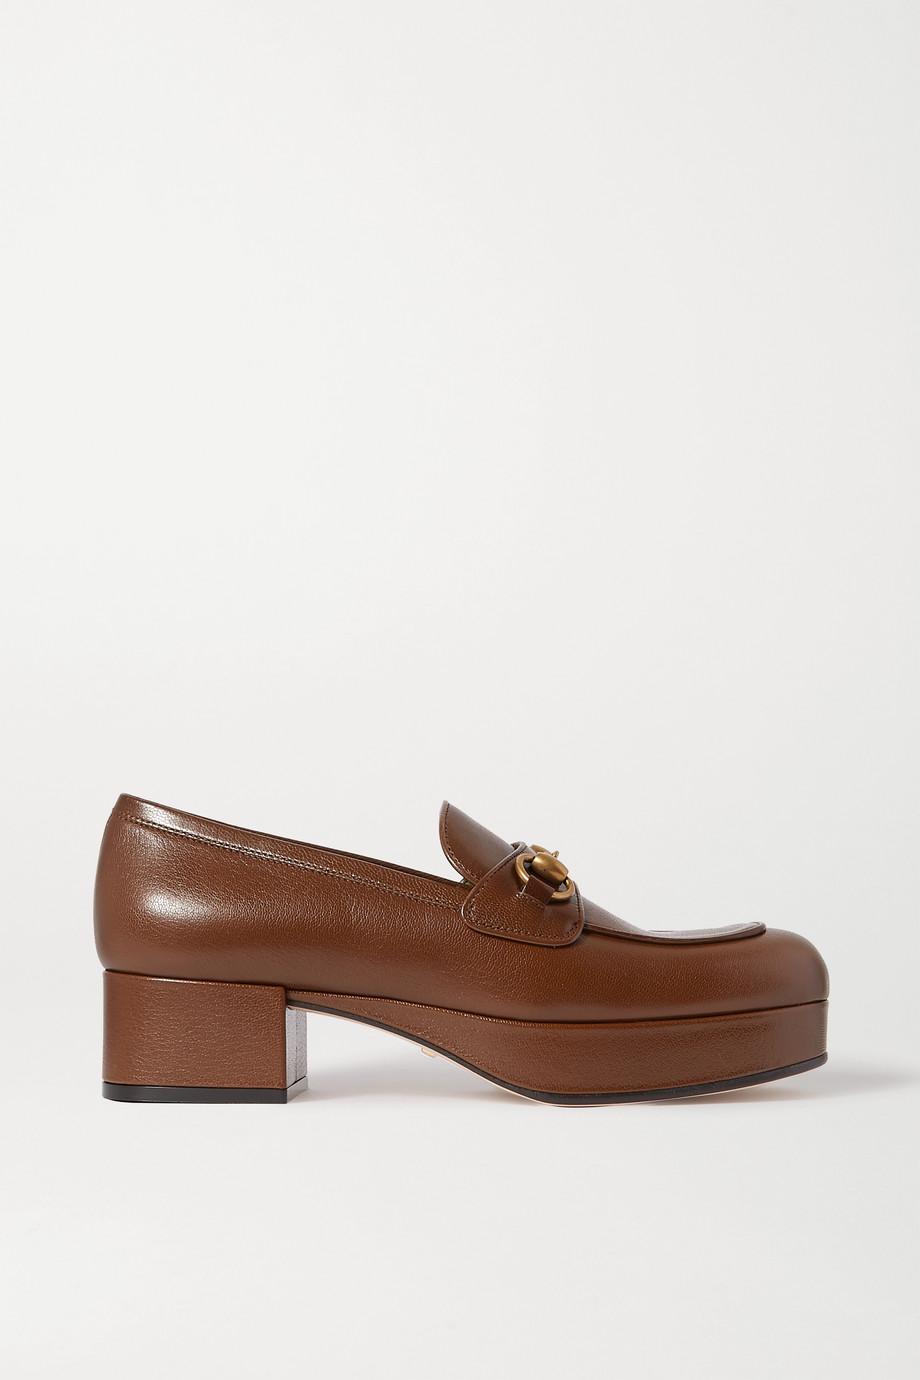 Gucci Houdan horsebit-detailed textured-leather platform pumps